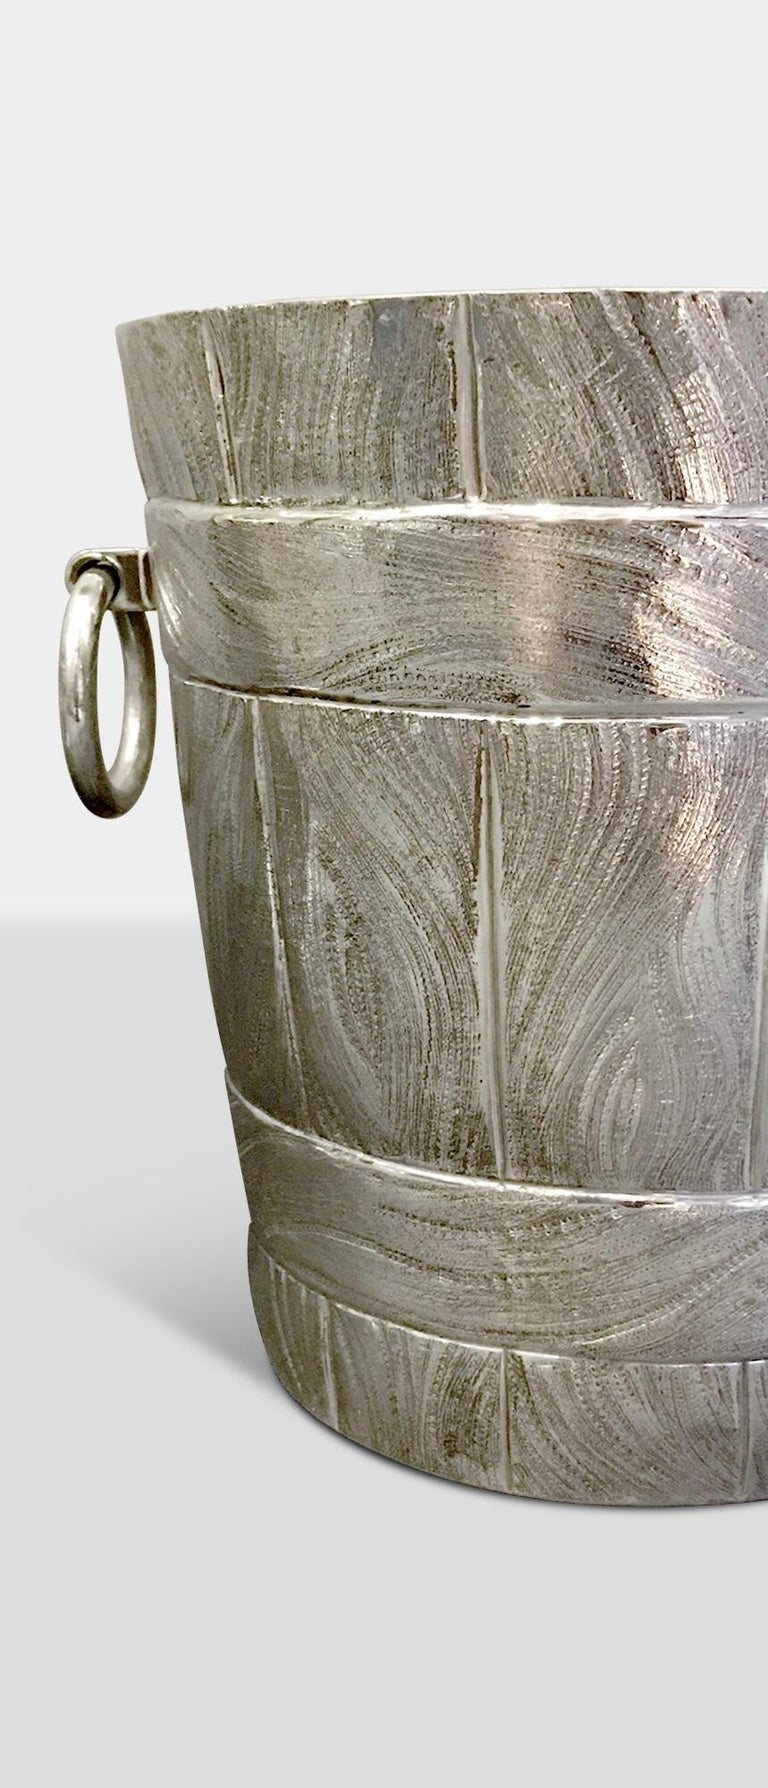 This ice bucket